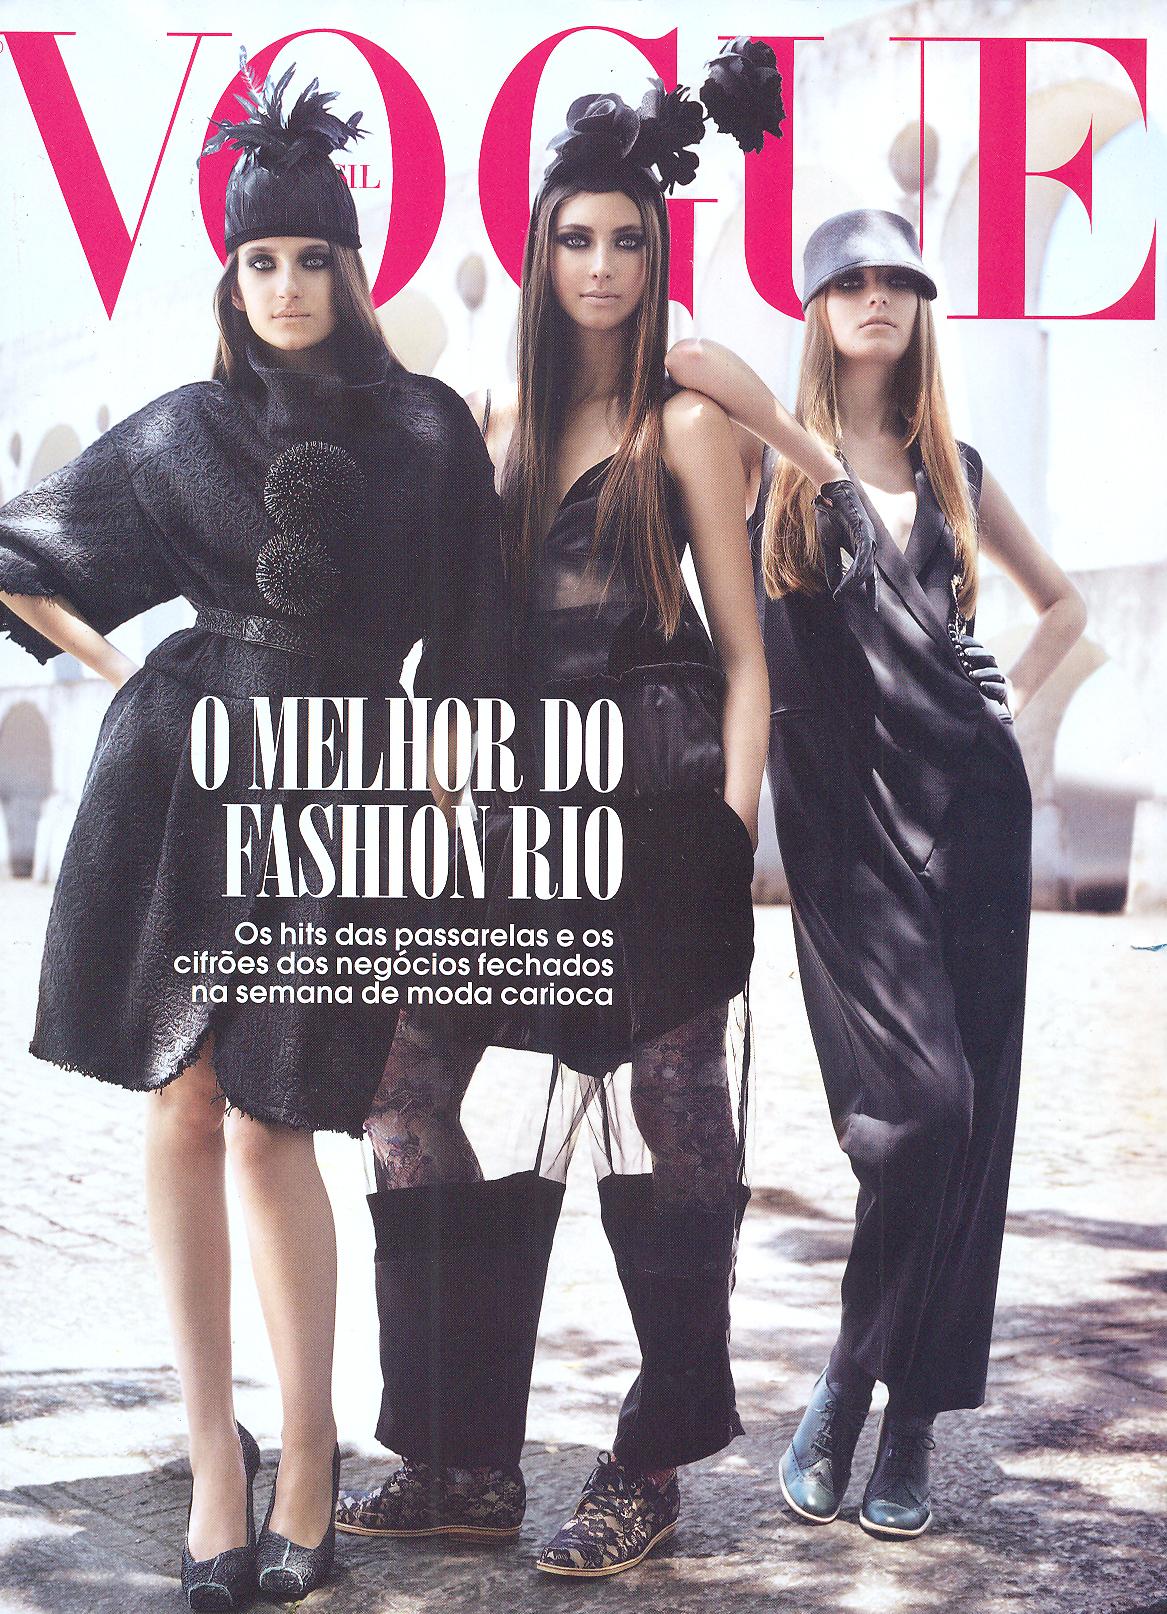 Caroline Demarqui (20) Vogue Brasil (cov